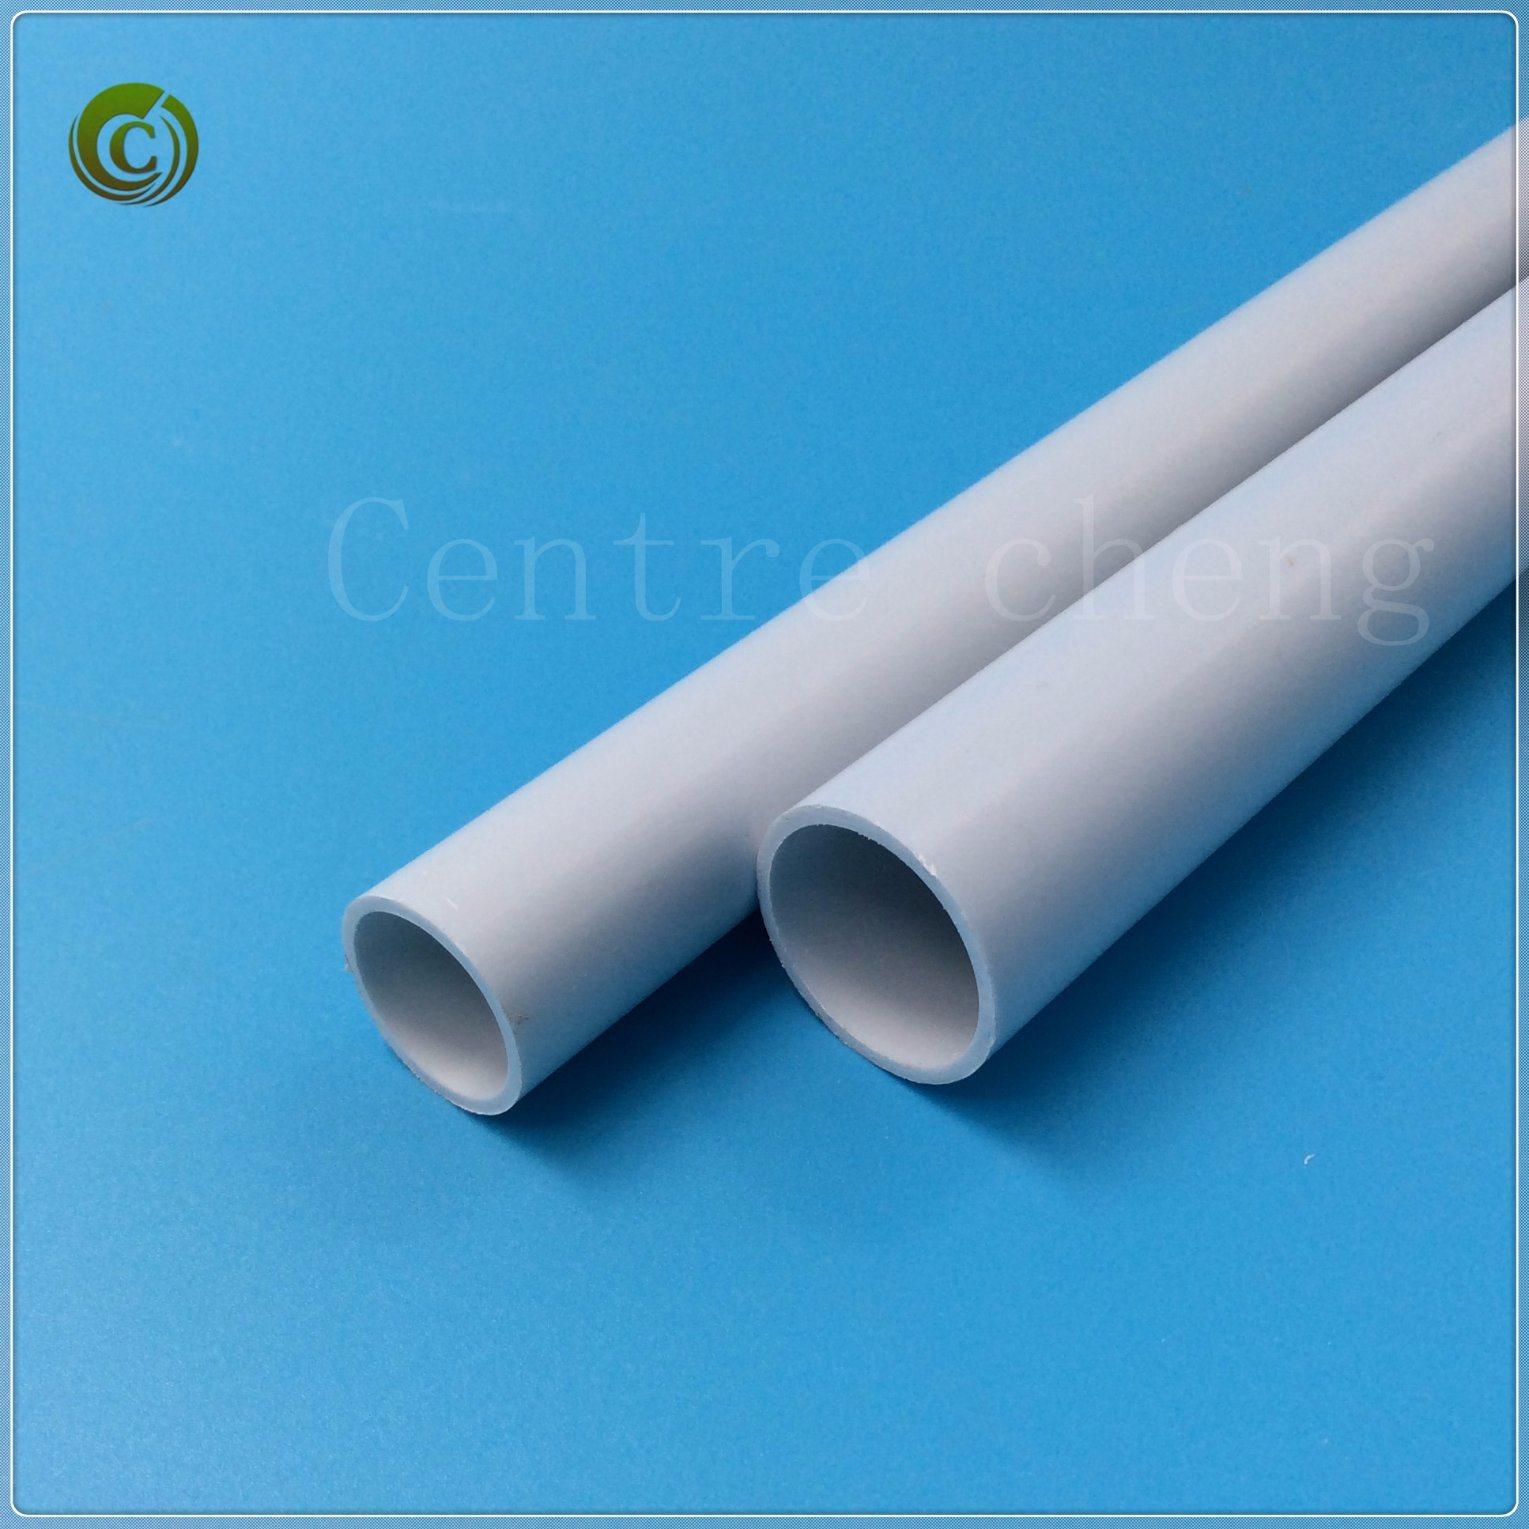 china 32mm pvc conduit pipe pvc electrical pipe for conduit wiring rh centrecheng en made in china com wiring with pvc conduit pvc conduit for electrical wiring